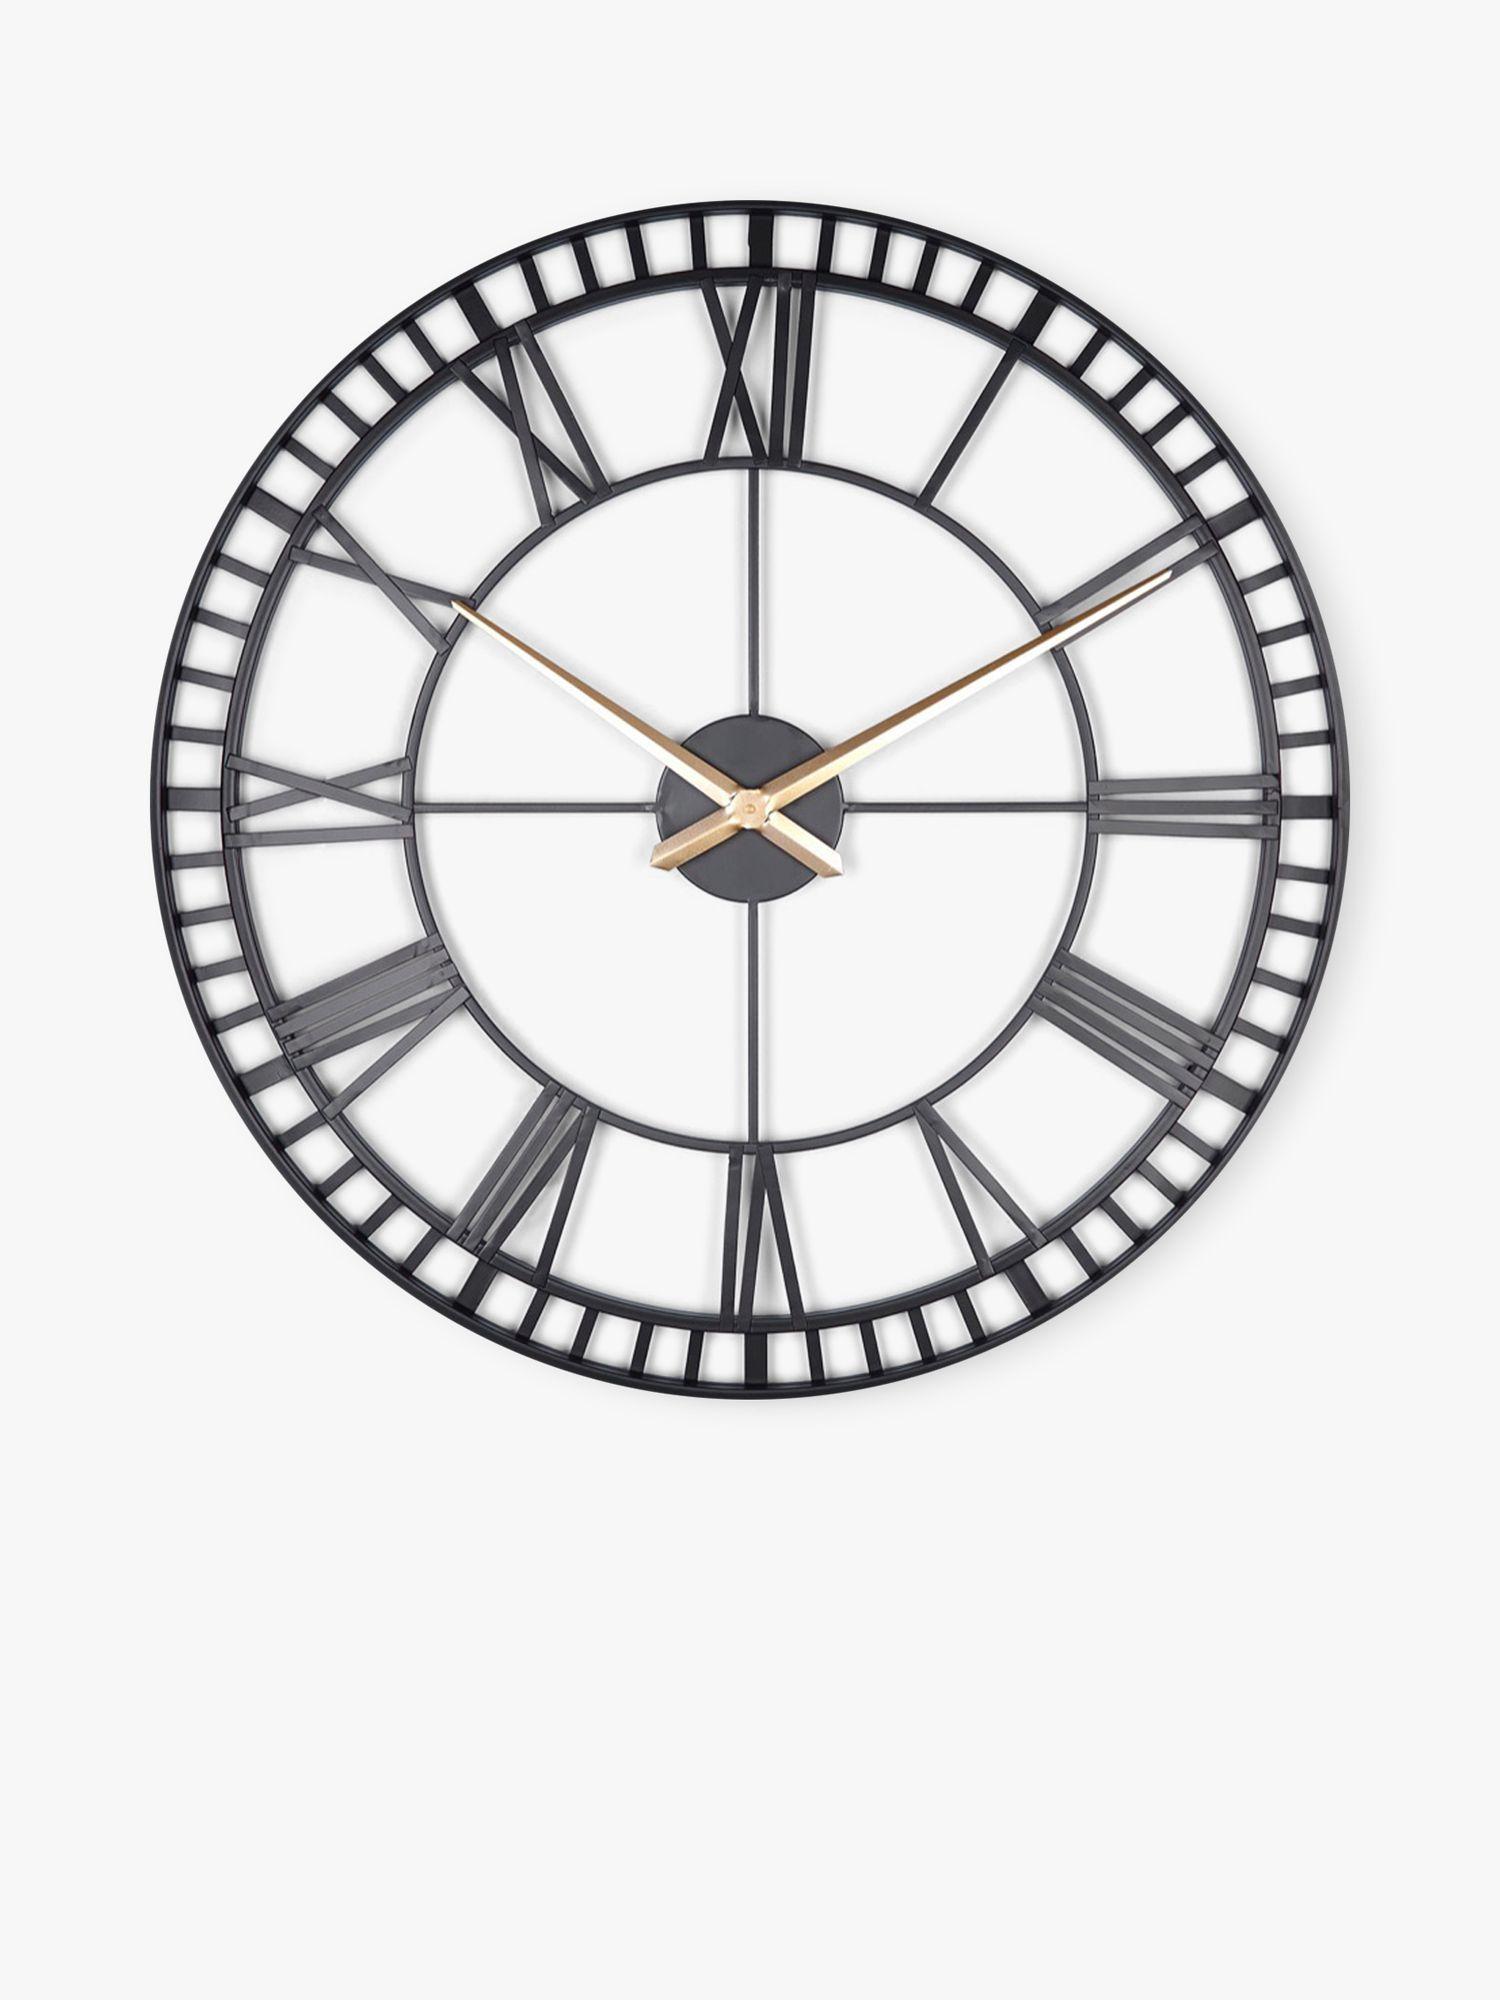 Lascelles Large Roman Numeral Skeleton Wall Clock 80cm Black Gold At John Lewis Partners